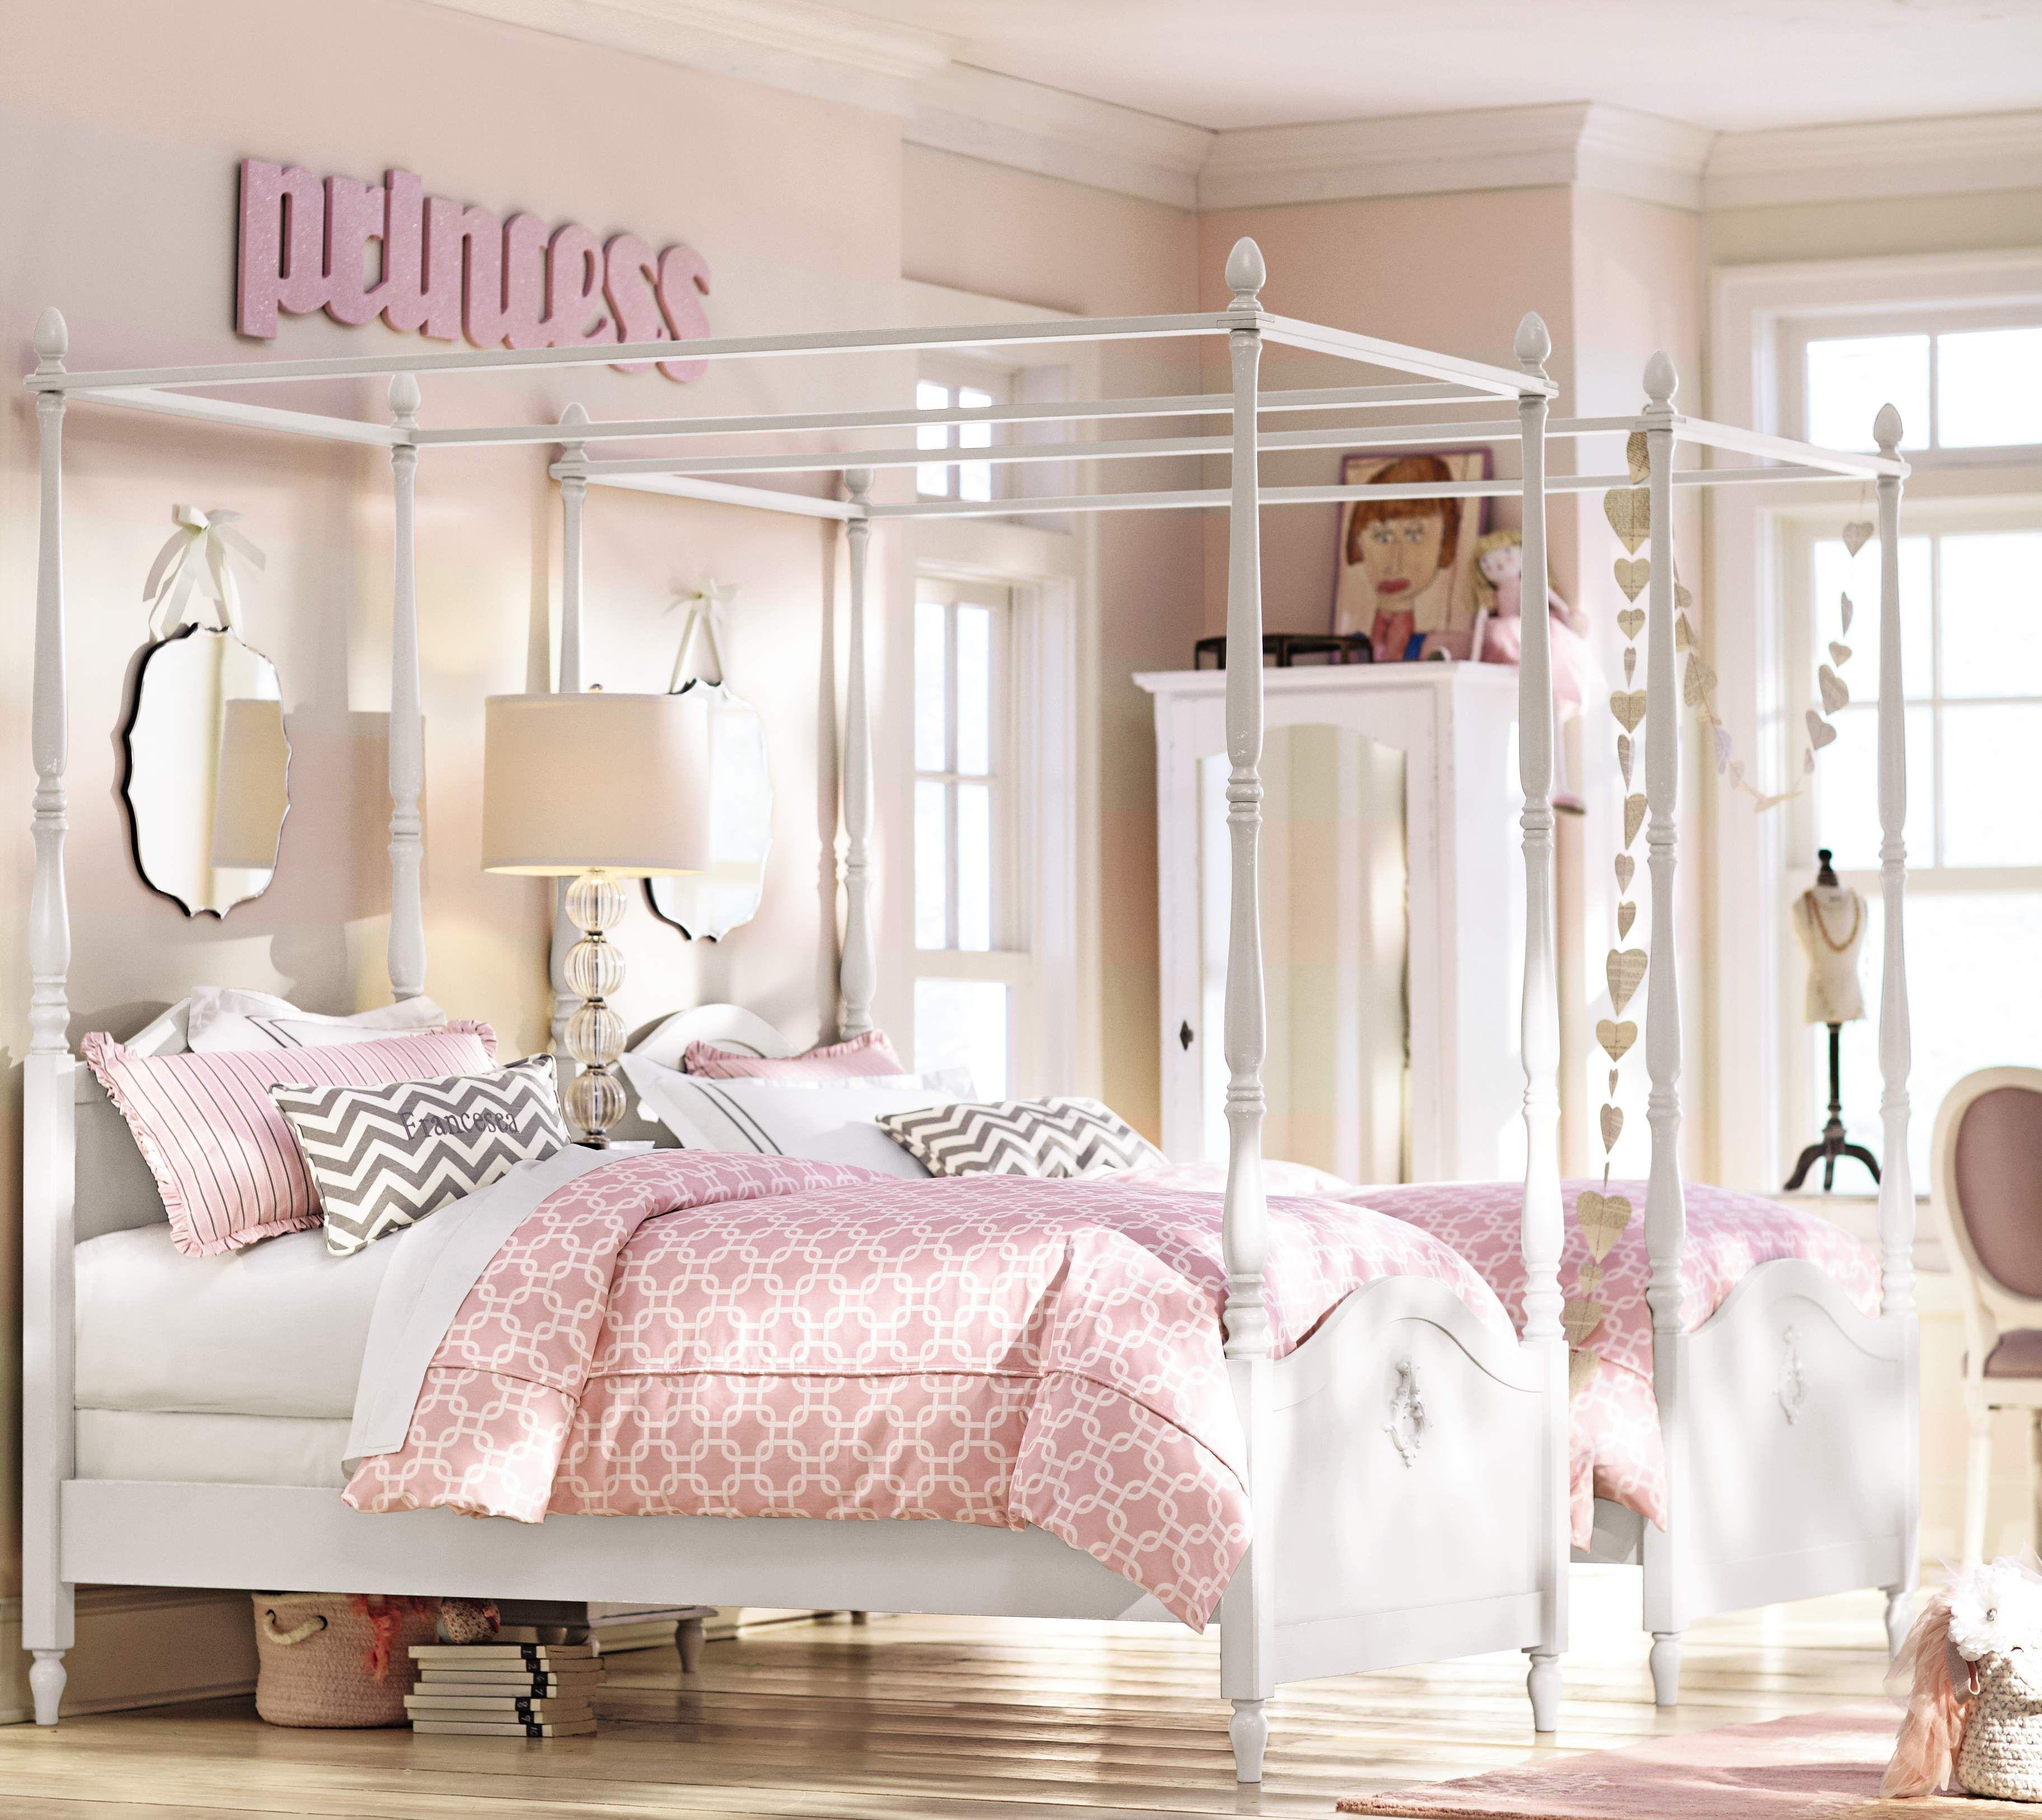 Twin beds. Double trouble. HomeDecorators.com